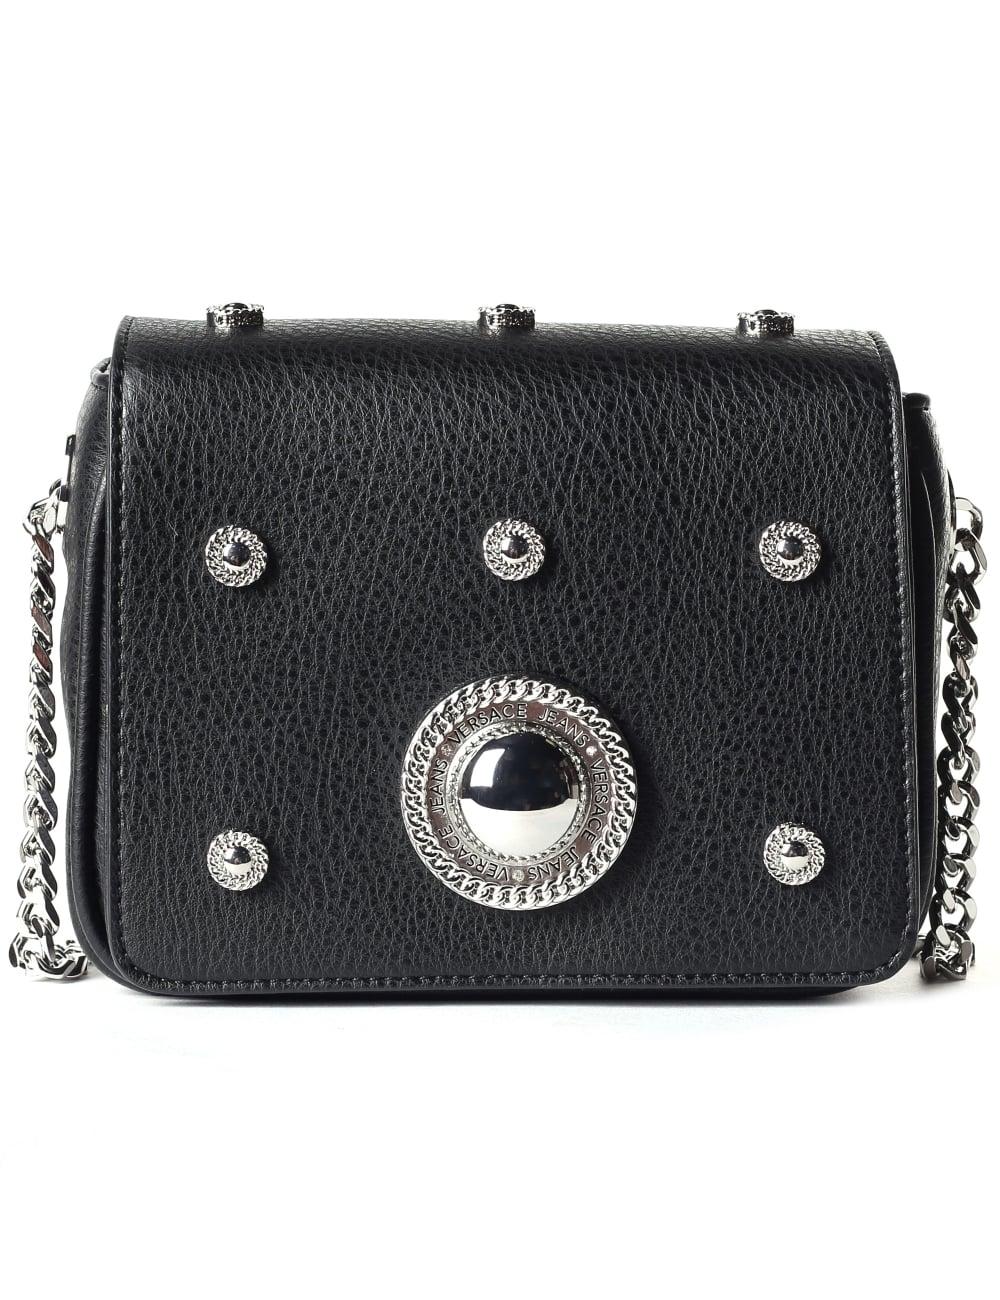 aad78f765c Versace Jeans Women's Studded Crossbody Bag